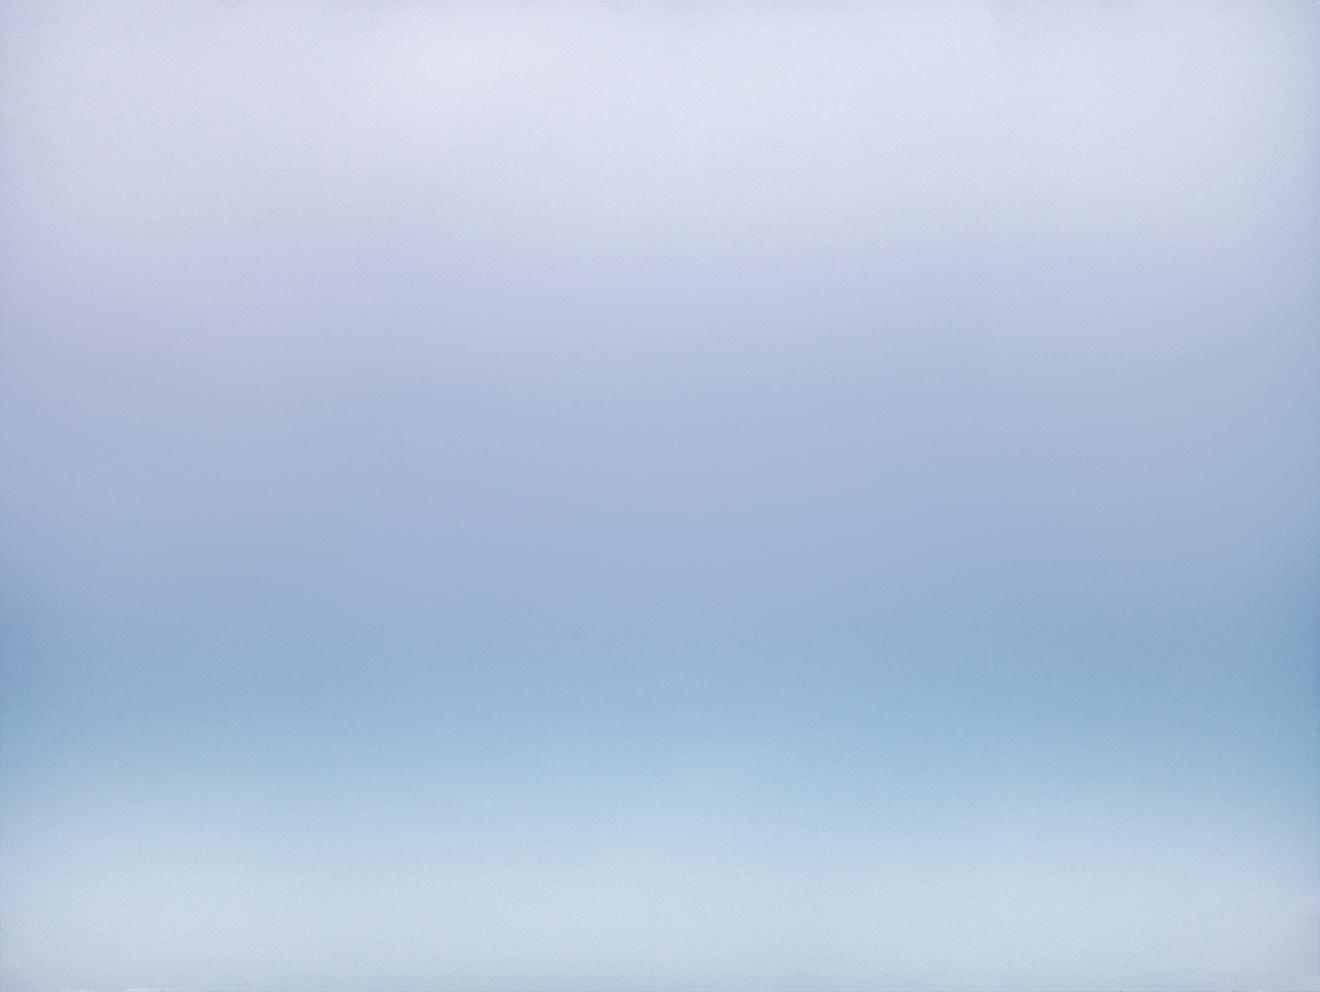 MURRAY FREDERICKS     Icesheet #5314  2013 digital pigment print, edition of 7 120 x 150 cm